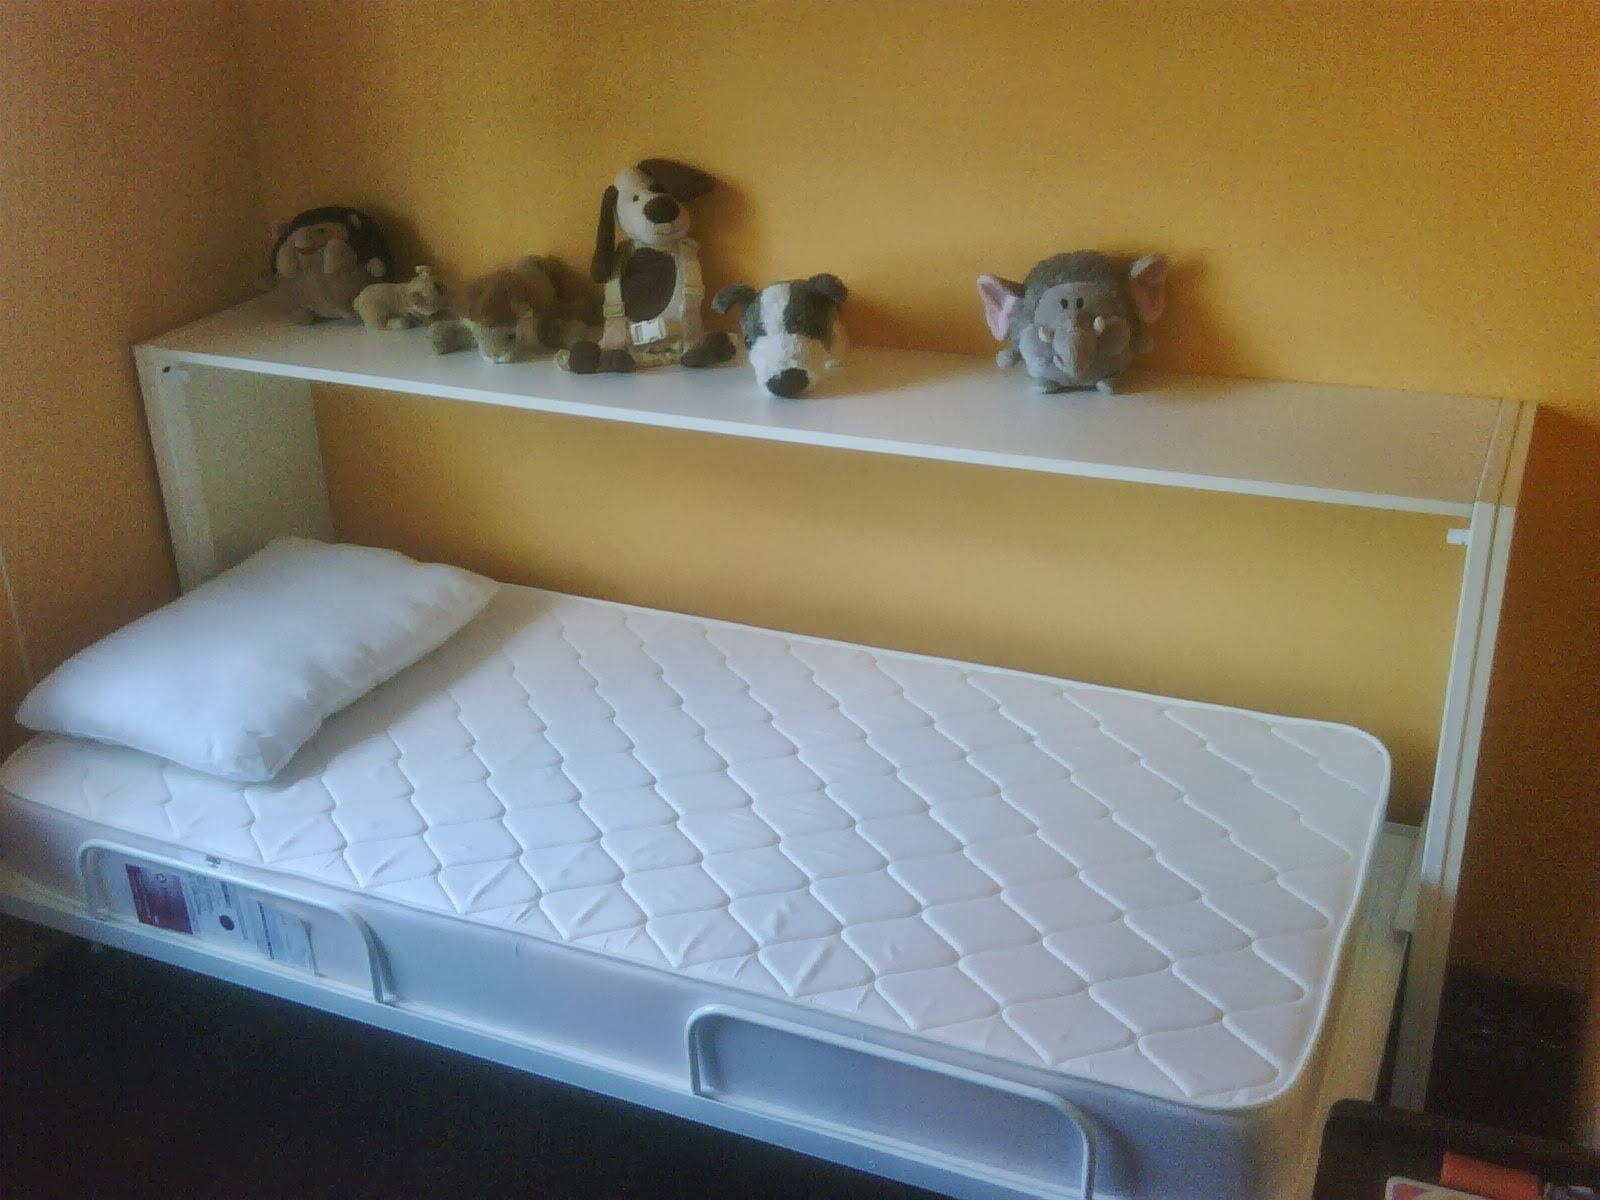 Venta camas plegables - Camas plegables horizontales ...